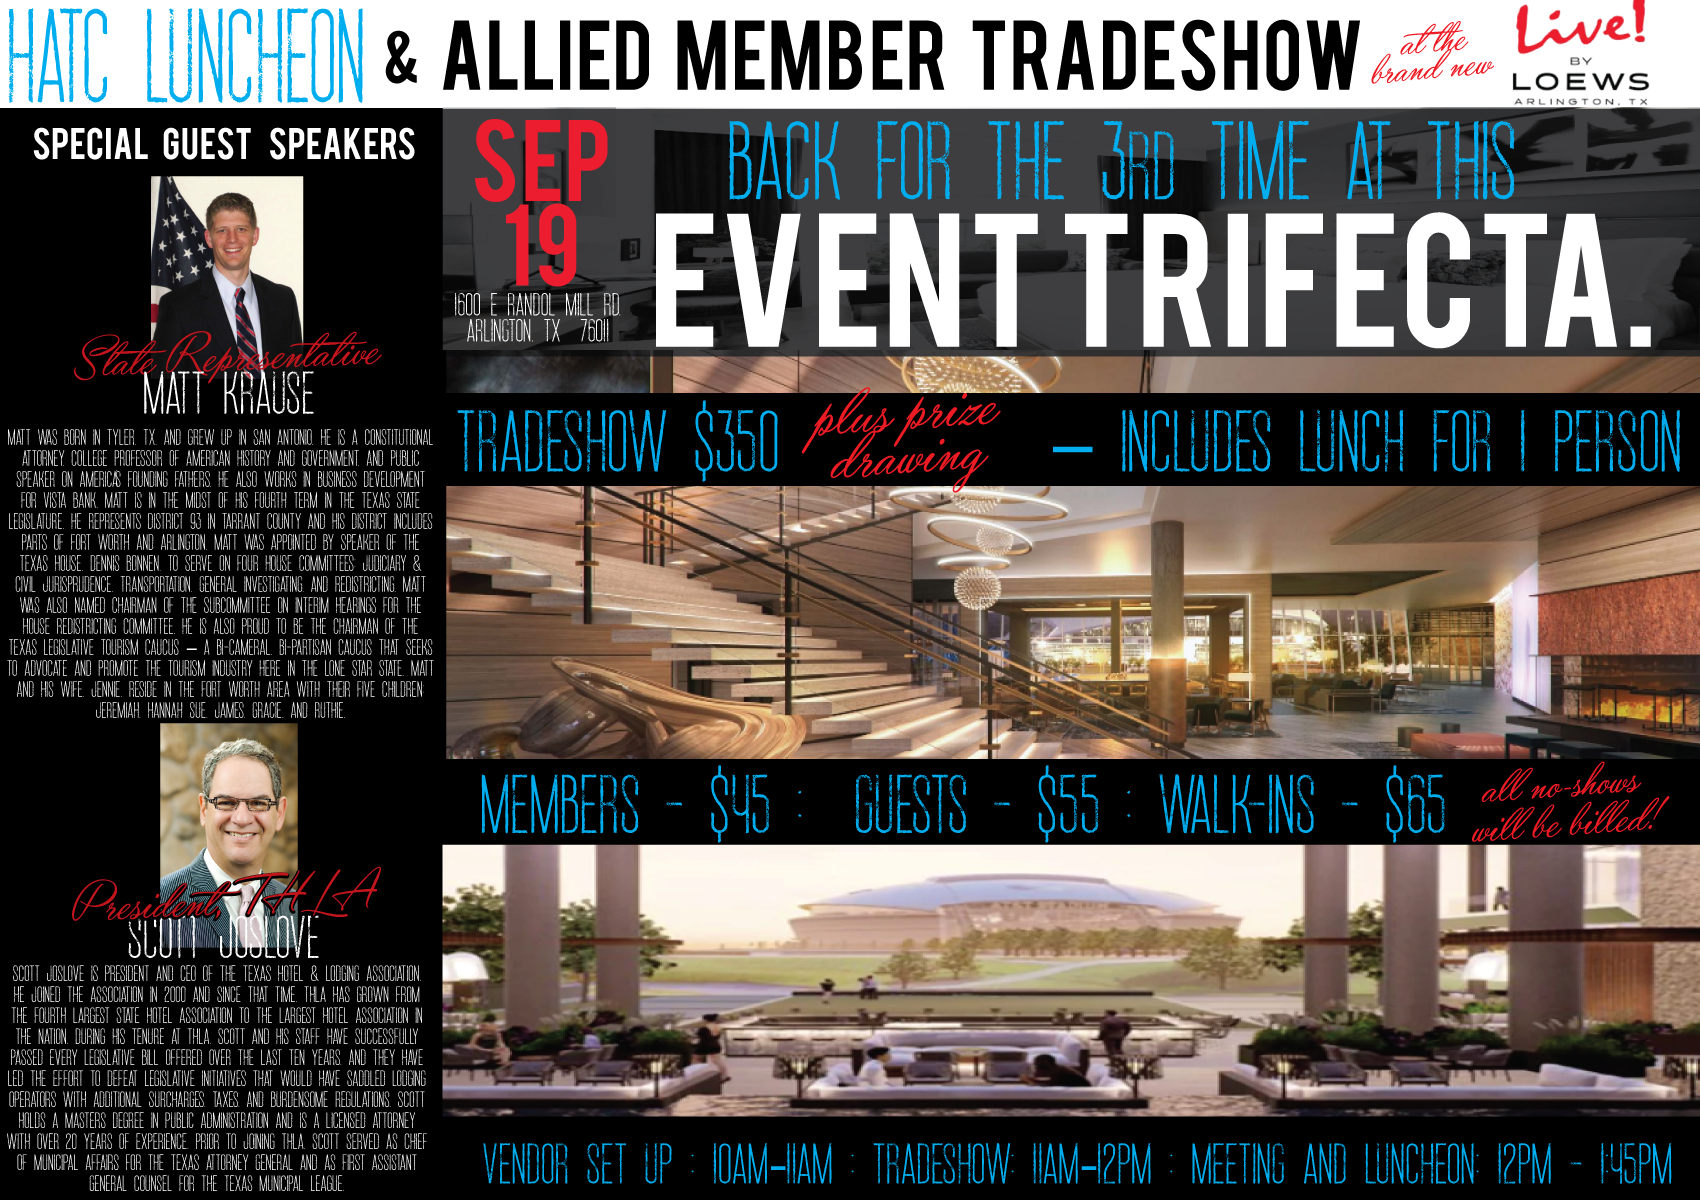 HATC Luncheon & Allied Member Tradeshow